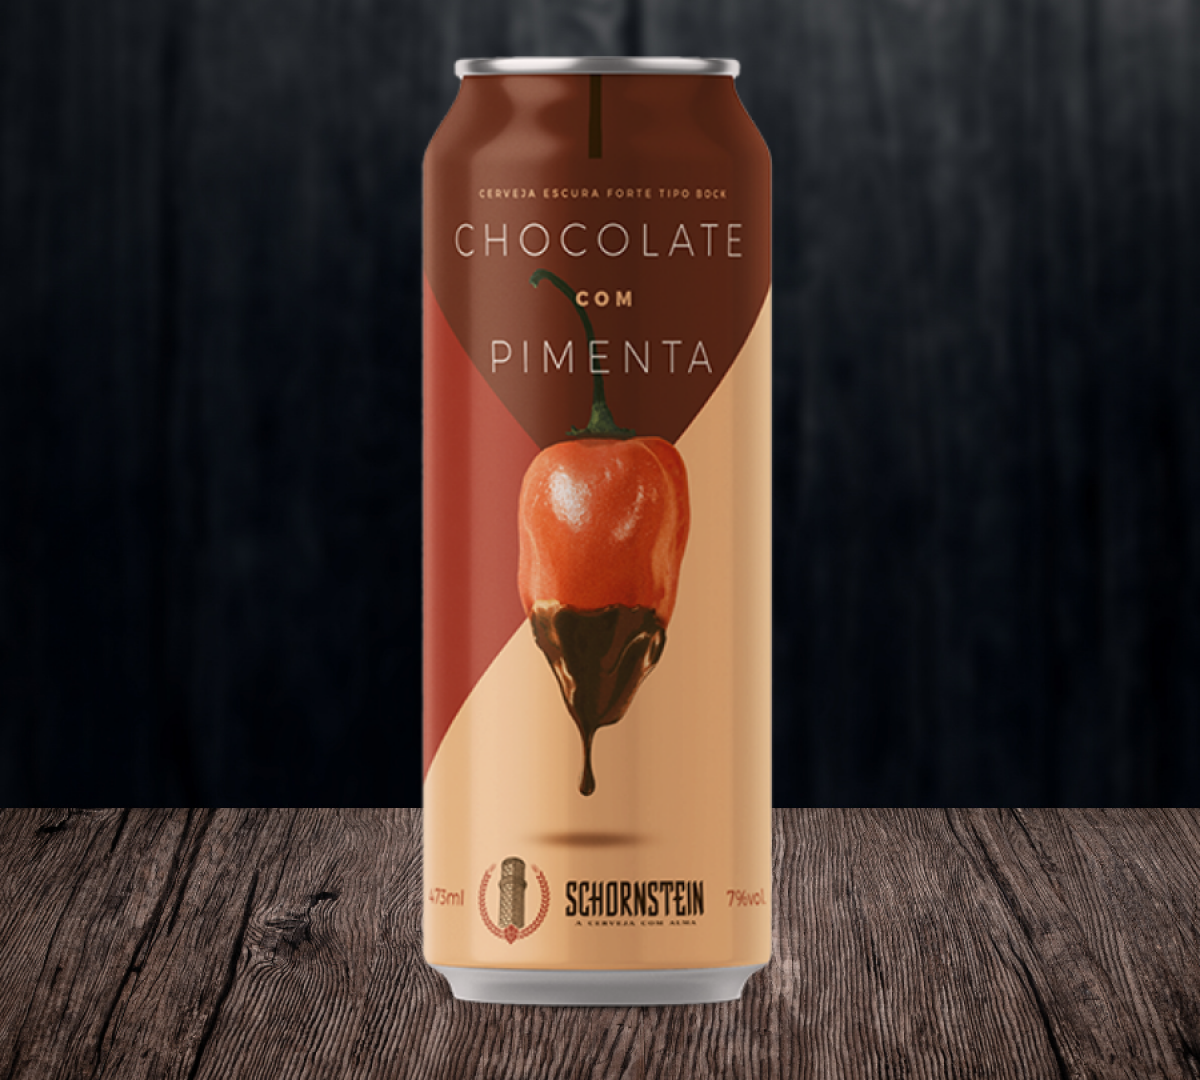 Schornstein Chocolate Com Pimenta (Bock)